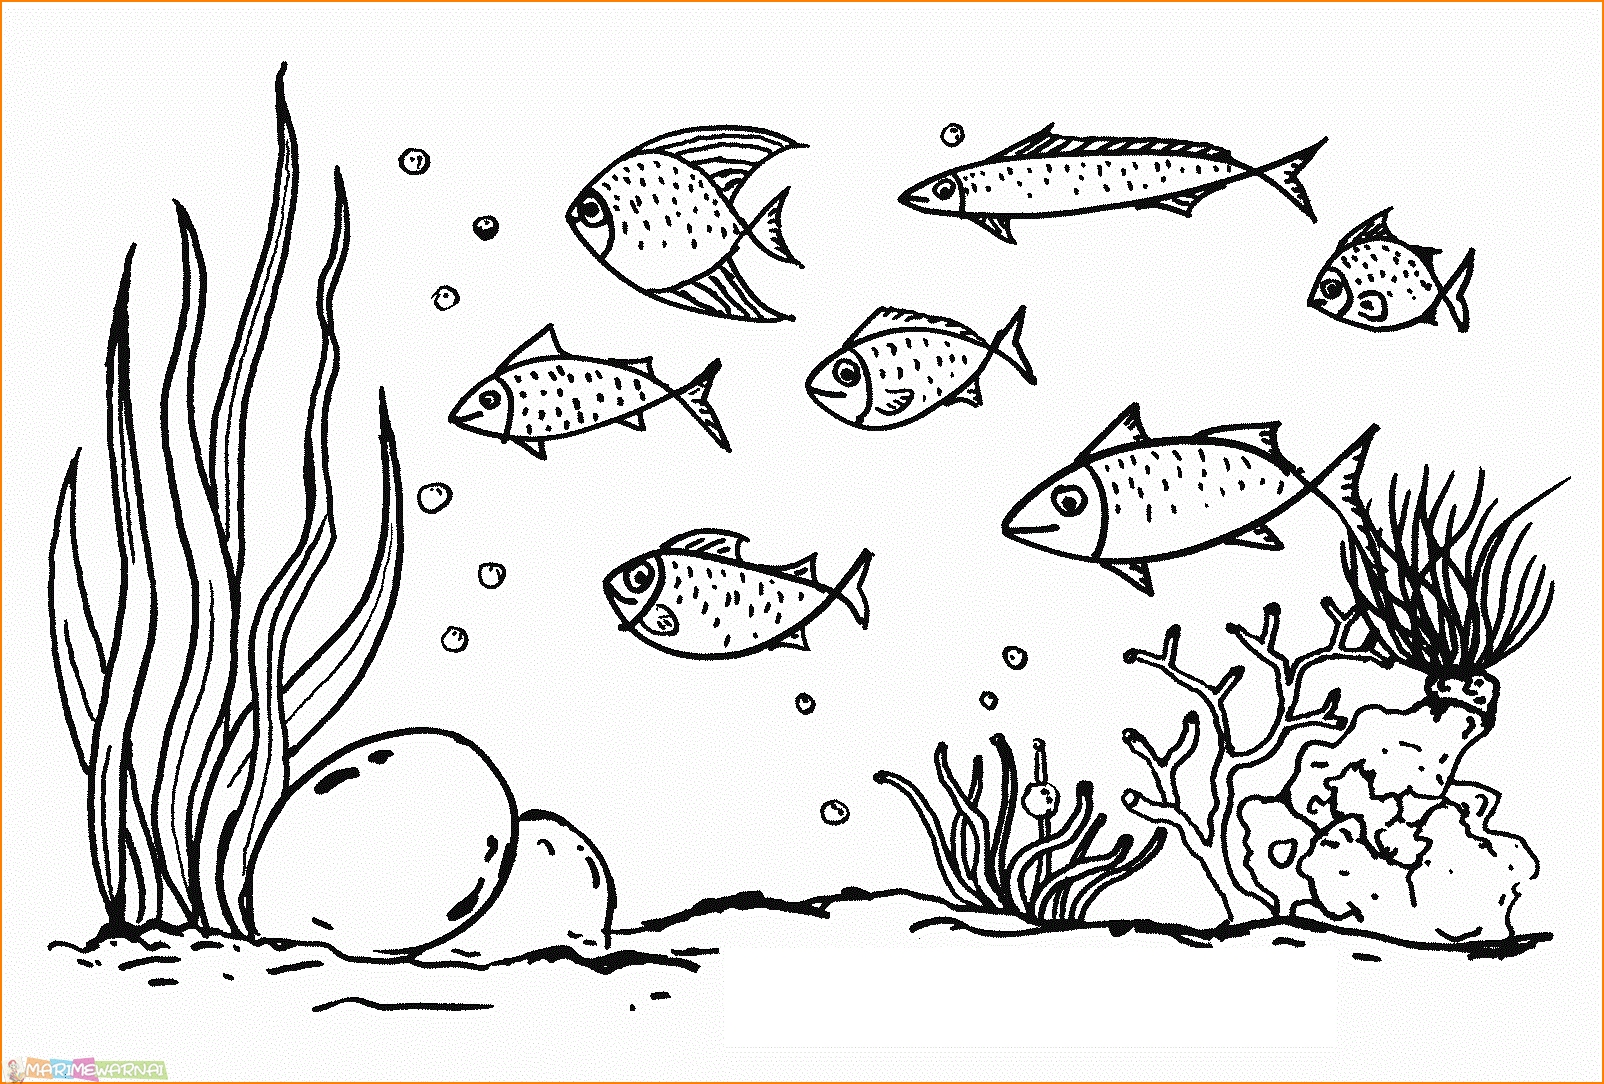 60 Paling Keren Gambar Mewarnai Macam Macam Ikan